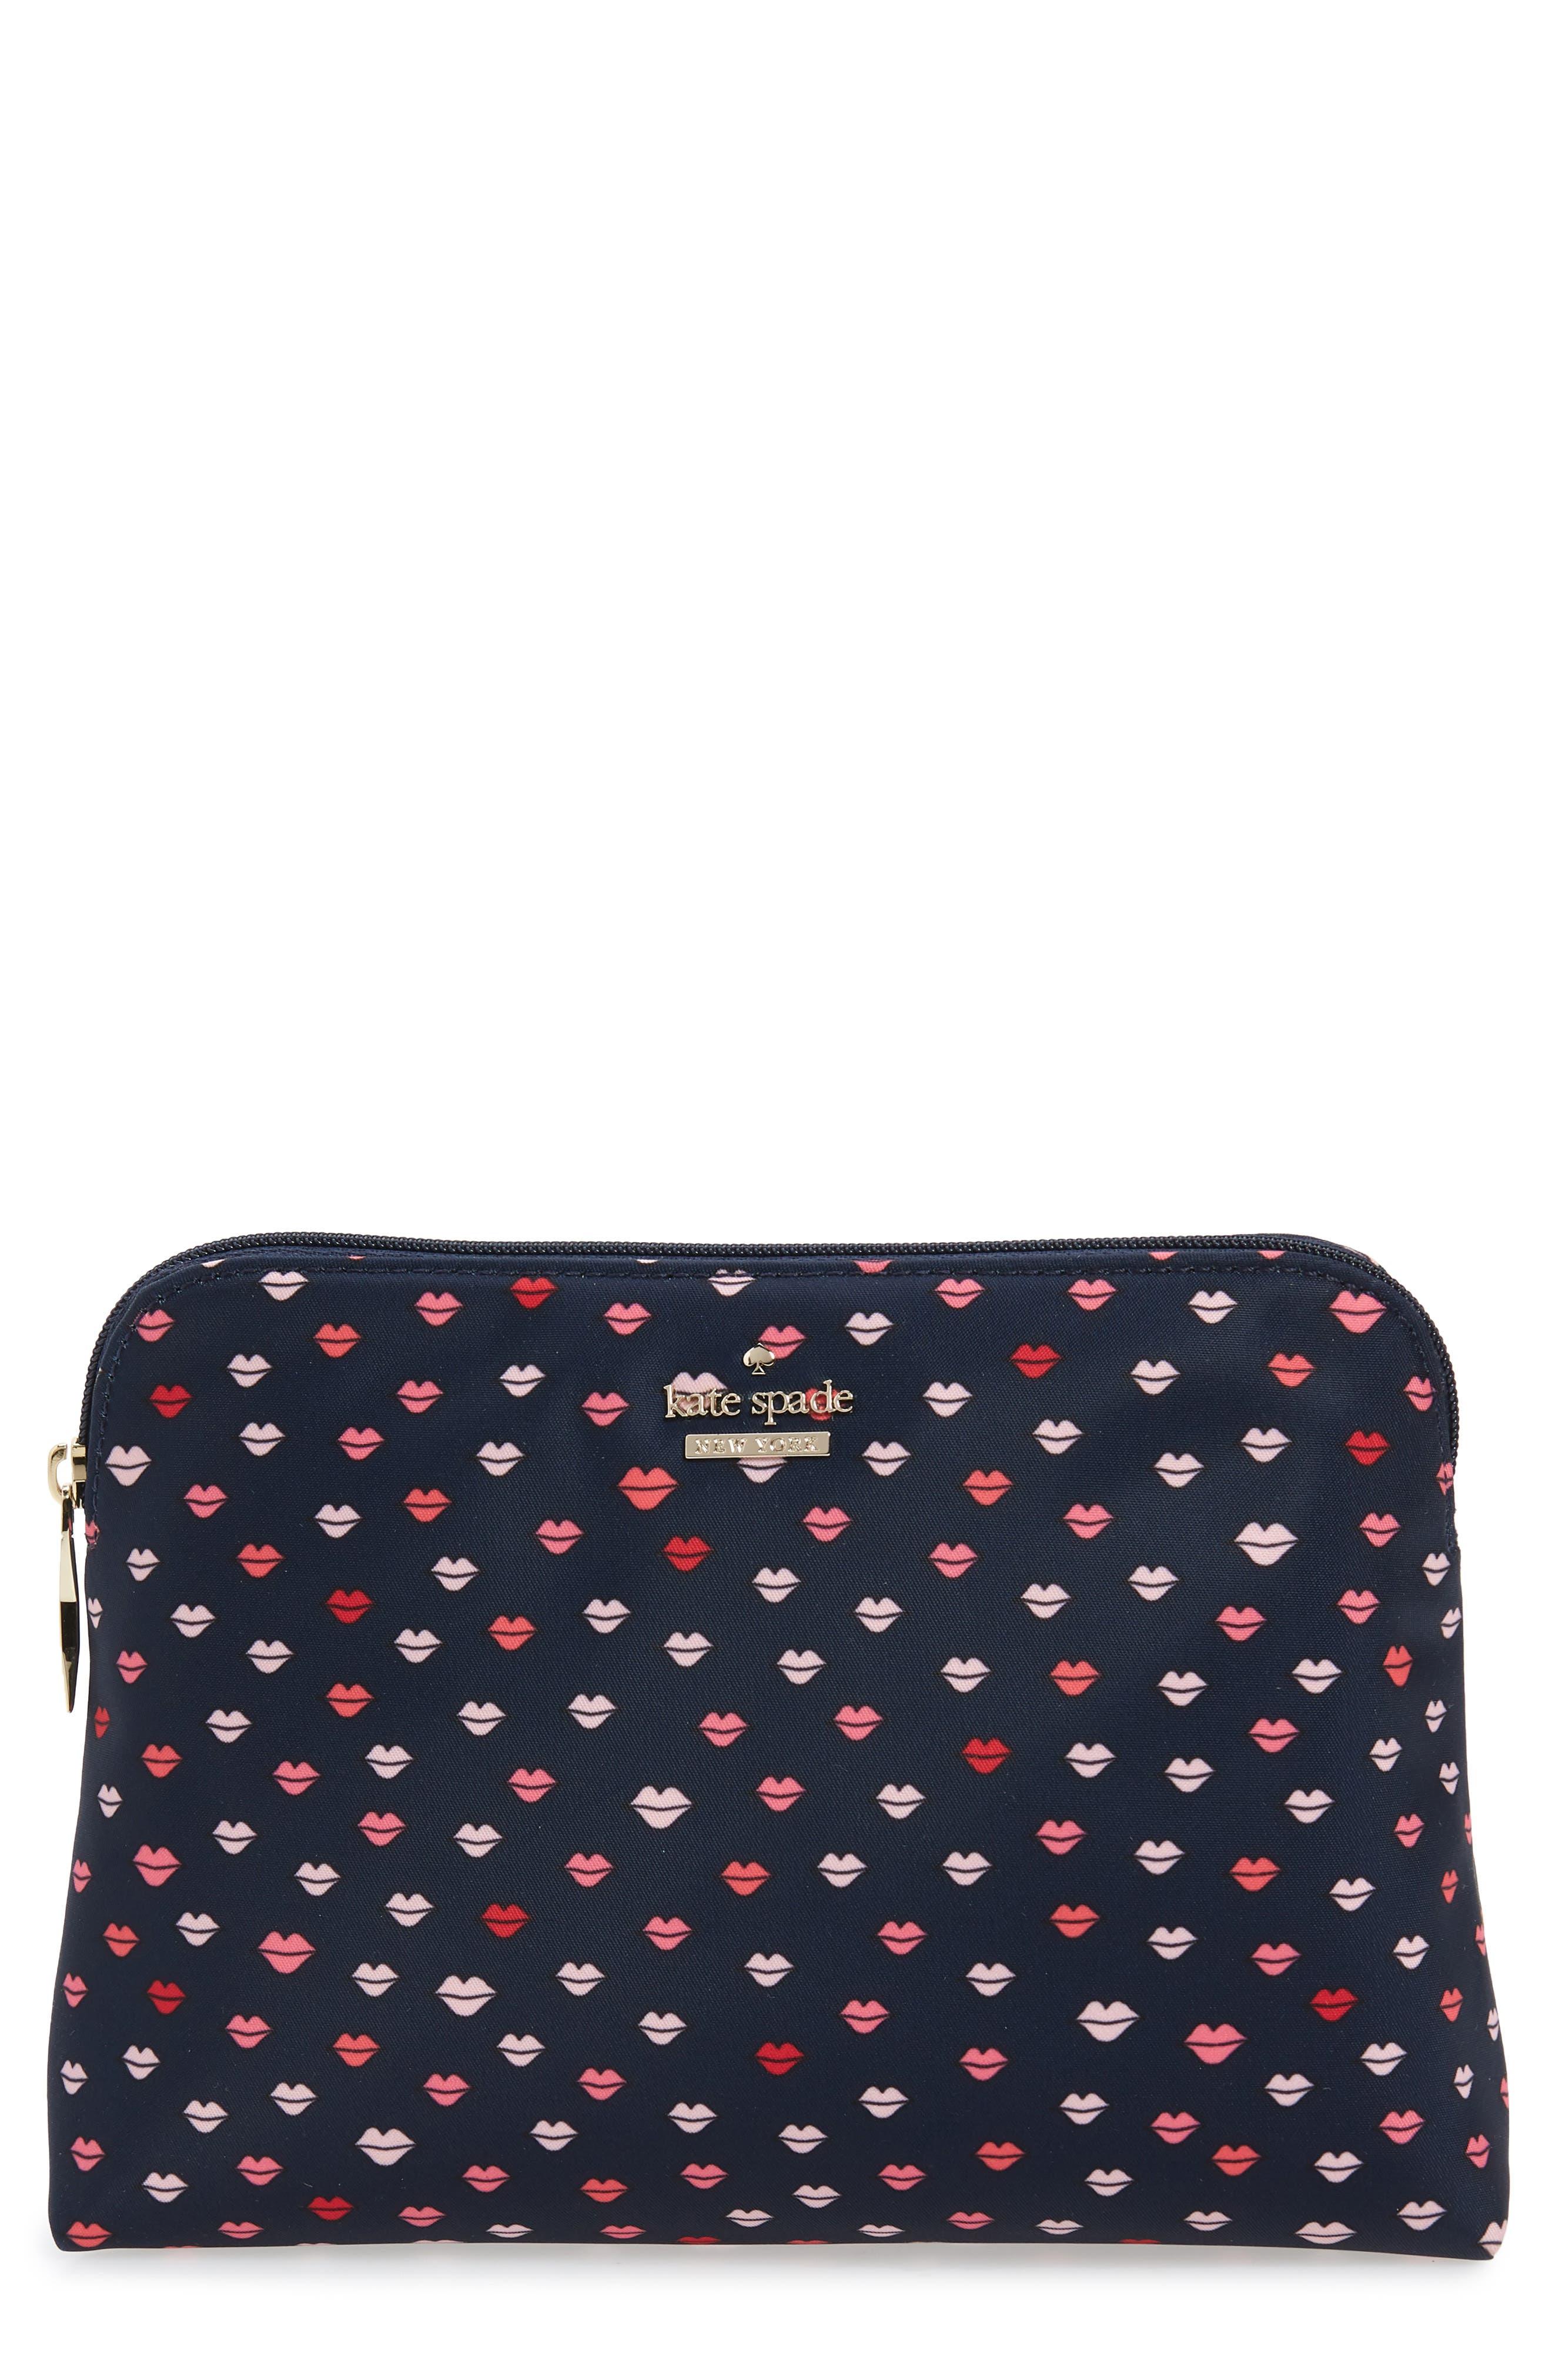 KATE SPADE NEW YORK,                             watson lane small briley cosmetic bag,                             Main thumbnail 1, color,                             NAVY MULTI